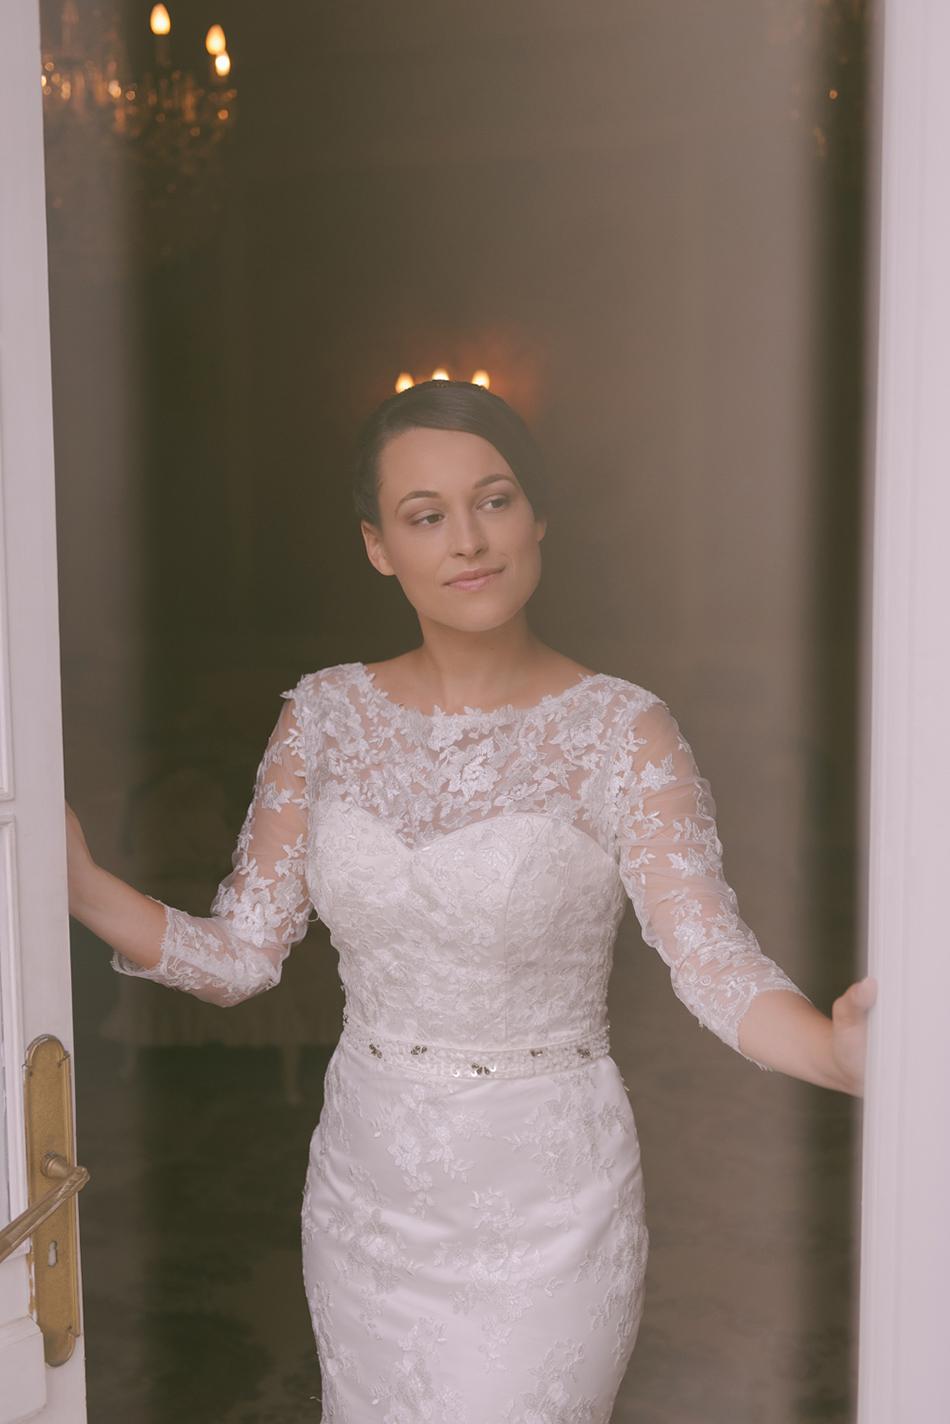 AD Passion Photography | fotograf-nunta-sinaia-flo-oana_0051 | Adelin, Dida, fotograf profesionist, fotograf de nunta, fotografie de nunta, fotograf Timisoara, fotograf Craiova, fotograf Bucuresti, fotograf Arad, nunta Timisoara, nunta Arad, nunta Bucuresti, nunta Craiova